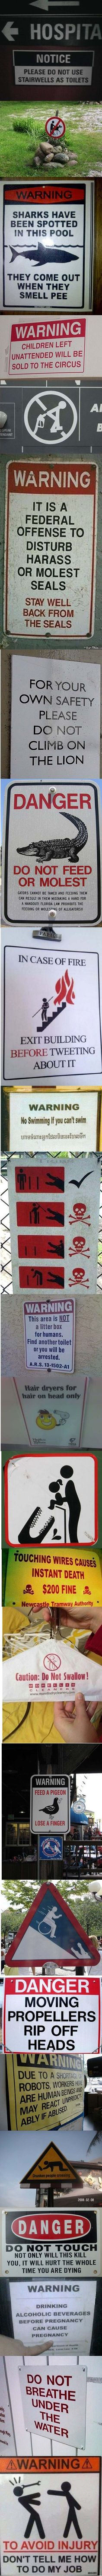 Signs #funny #lol #humor